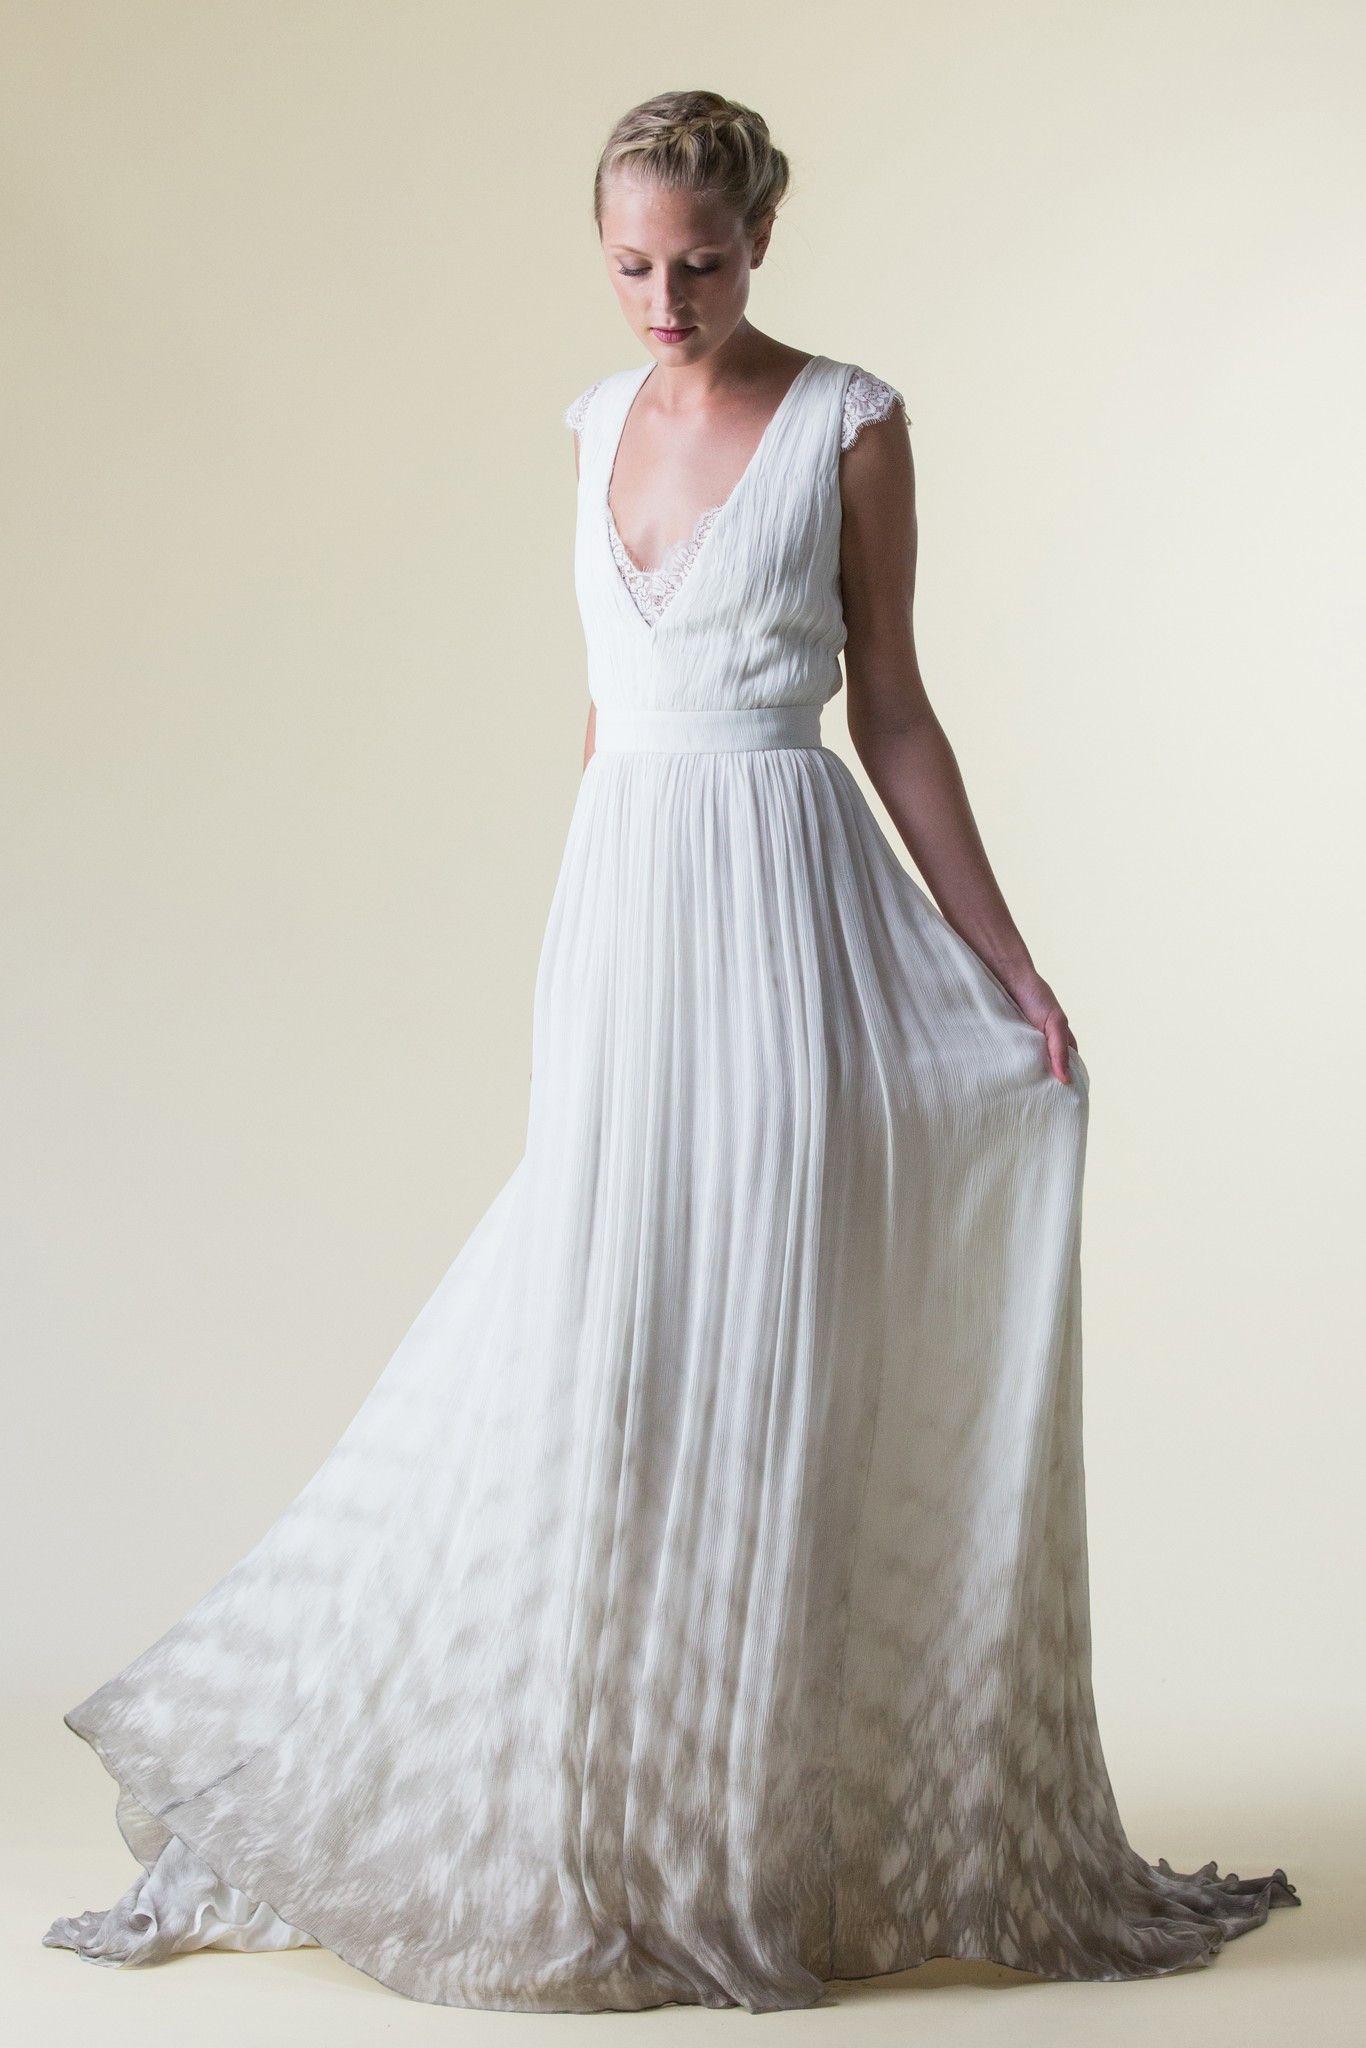 Grey Goddess | Handmade wedding dresses, Handmade wedding and ...